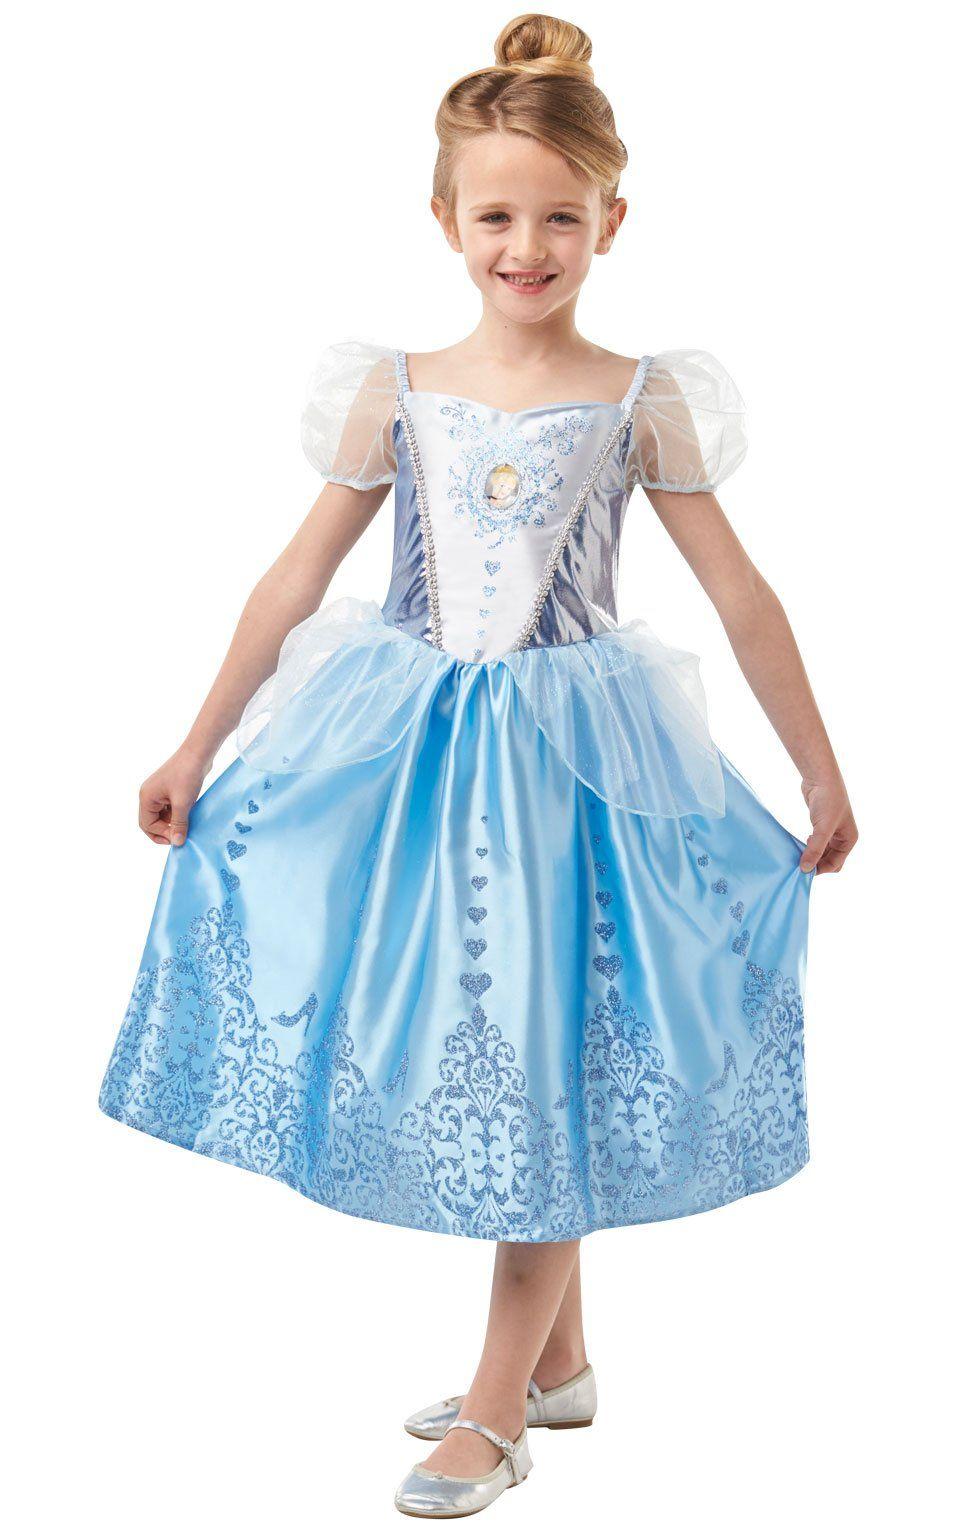 Girls Gem Cinderella Costume Disney Princess Child Fancy Dress Outfit